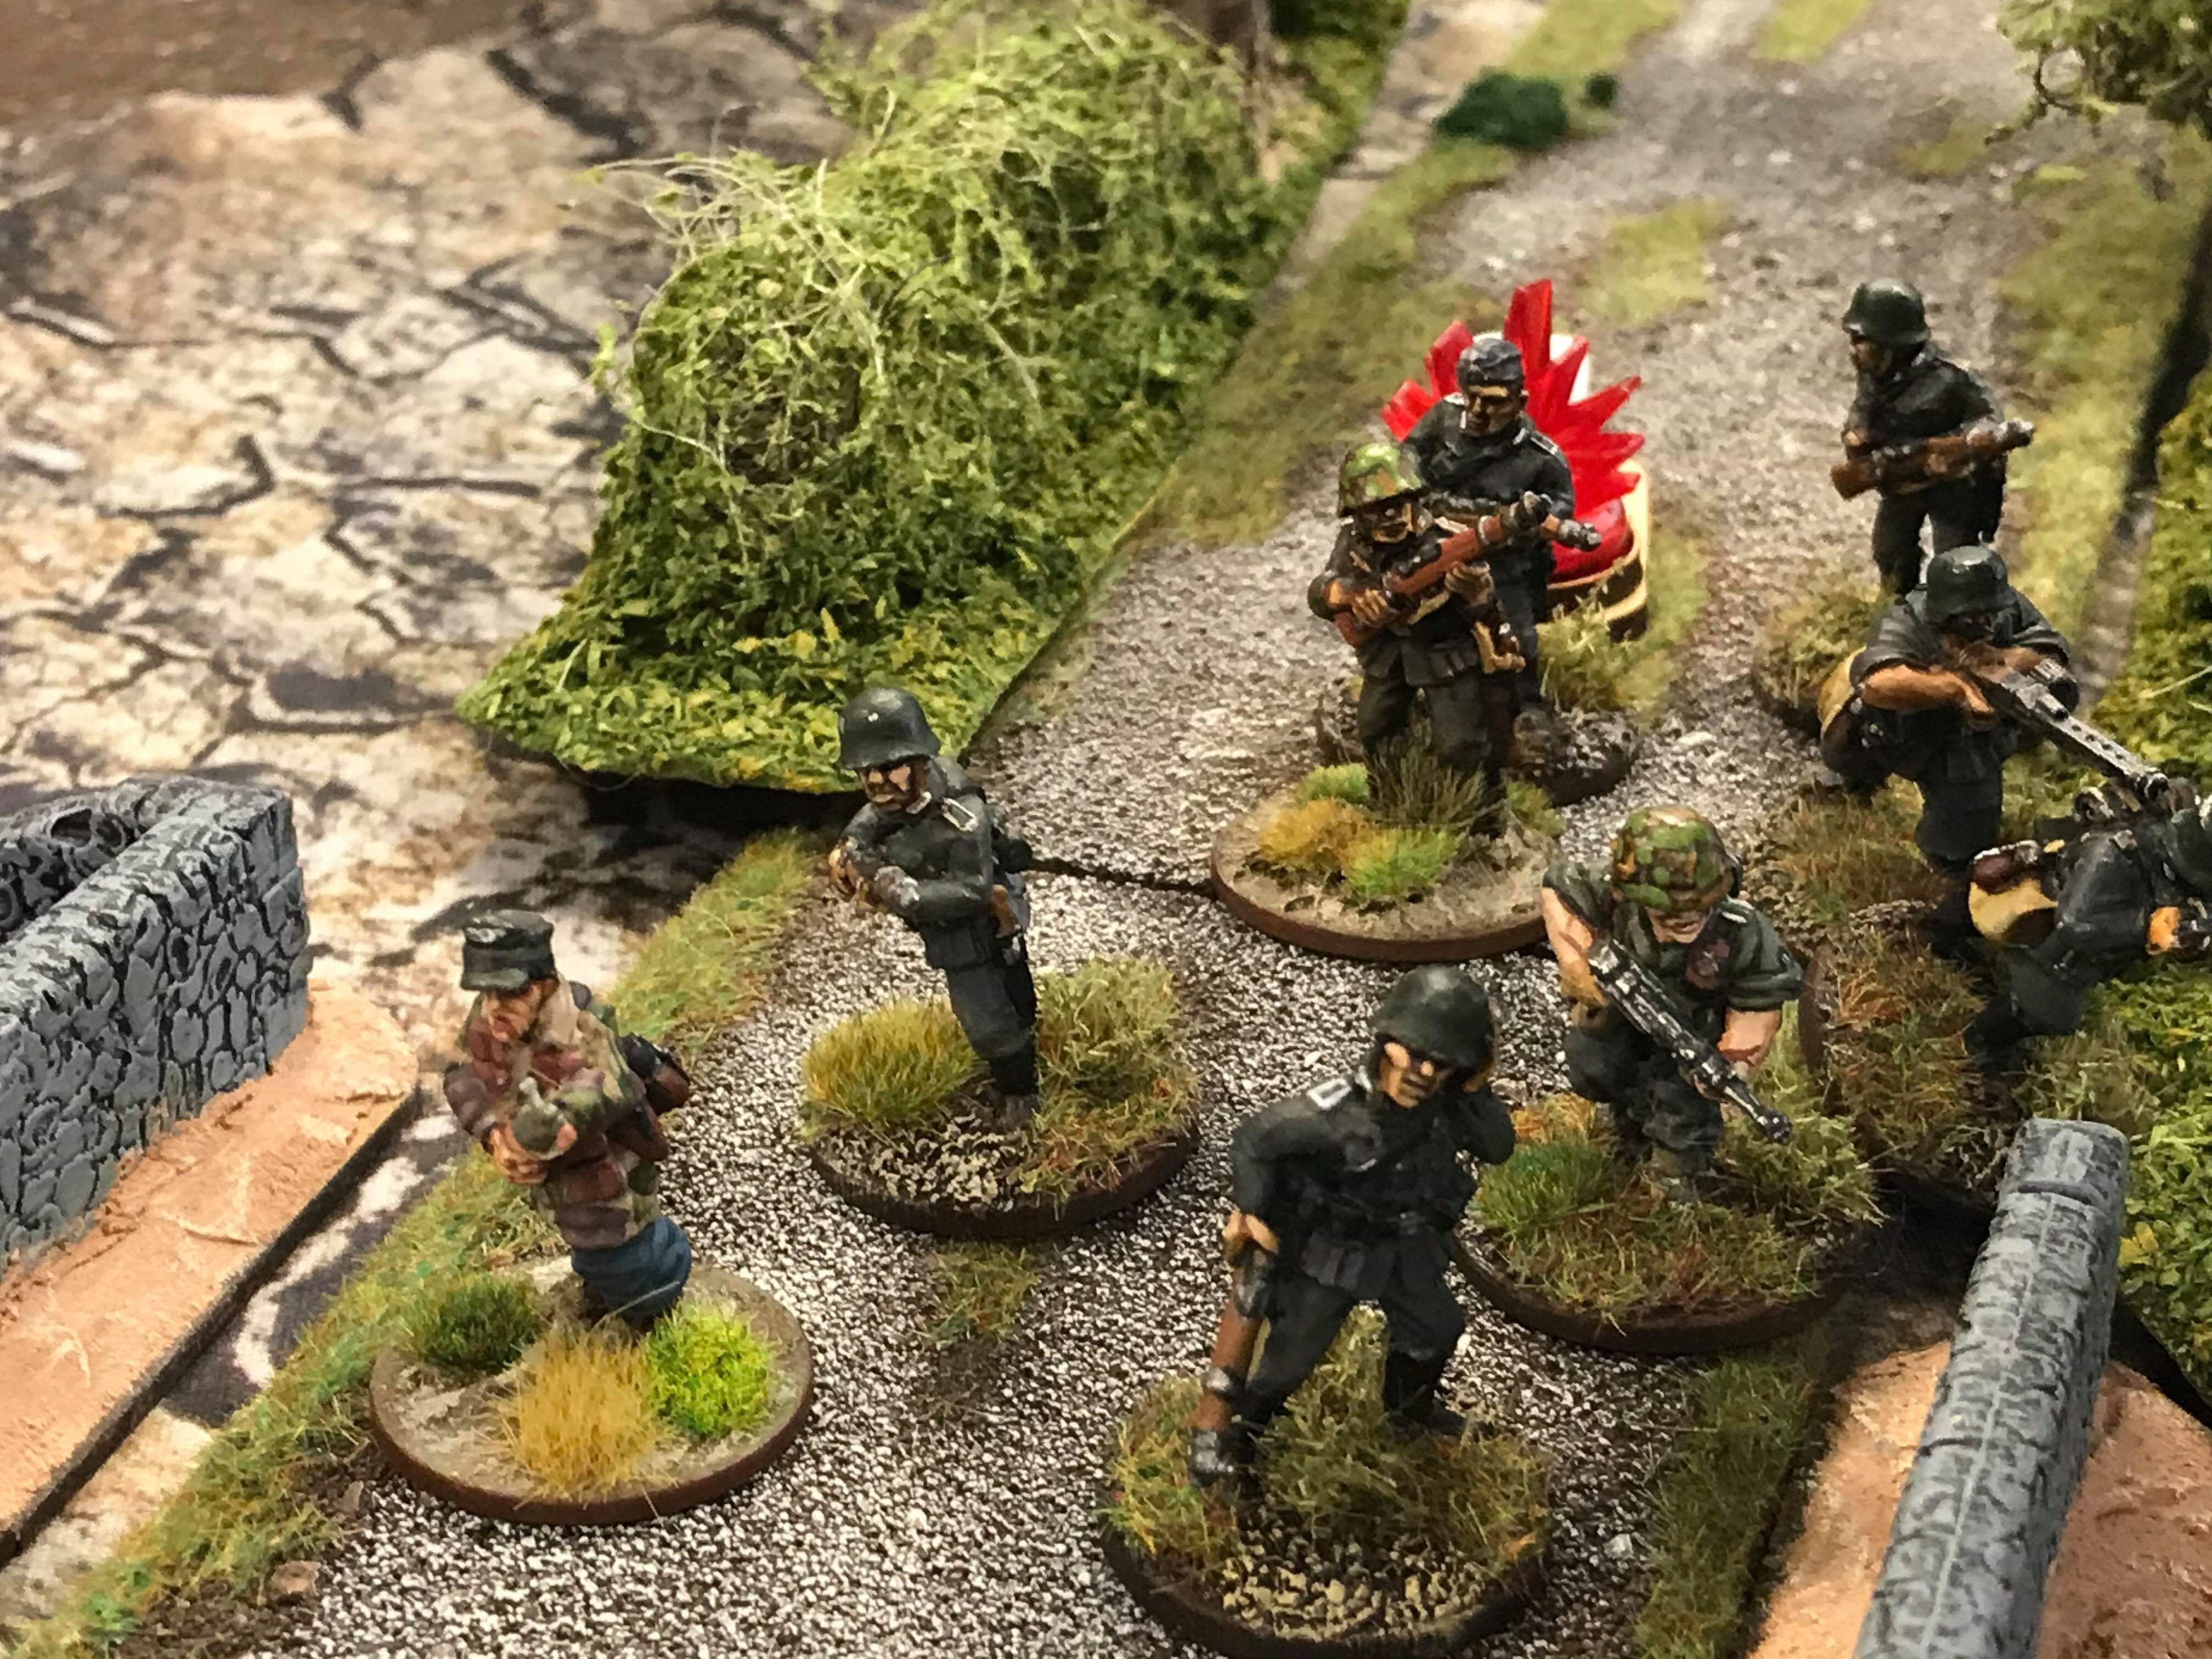 Jommes d'honneur versus Kelly's un heroes in a fierce infantry engagement